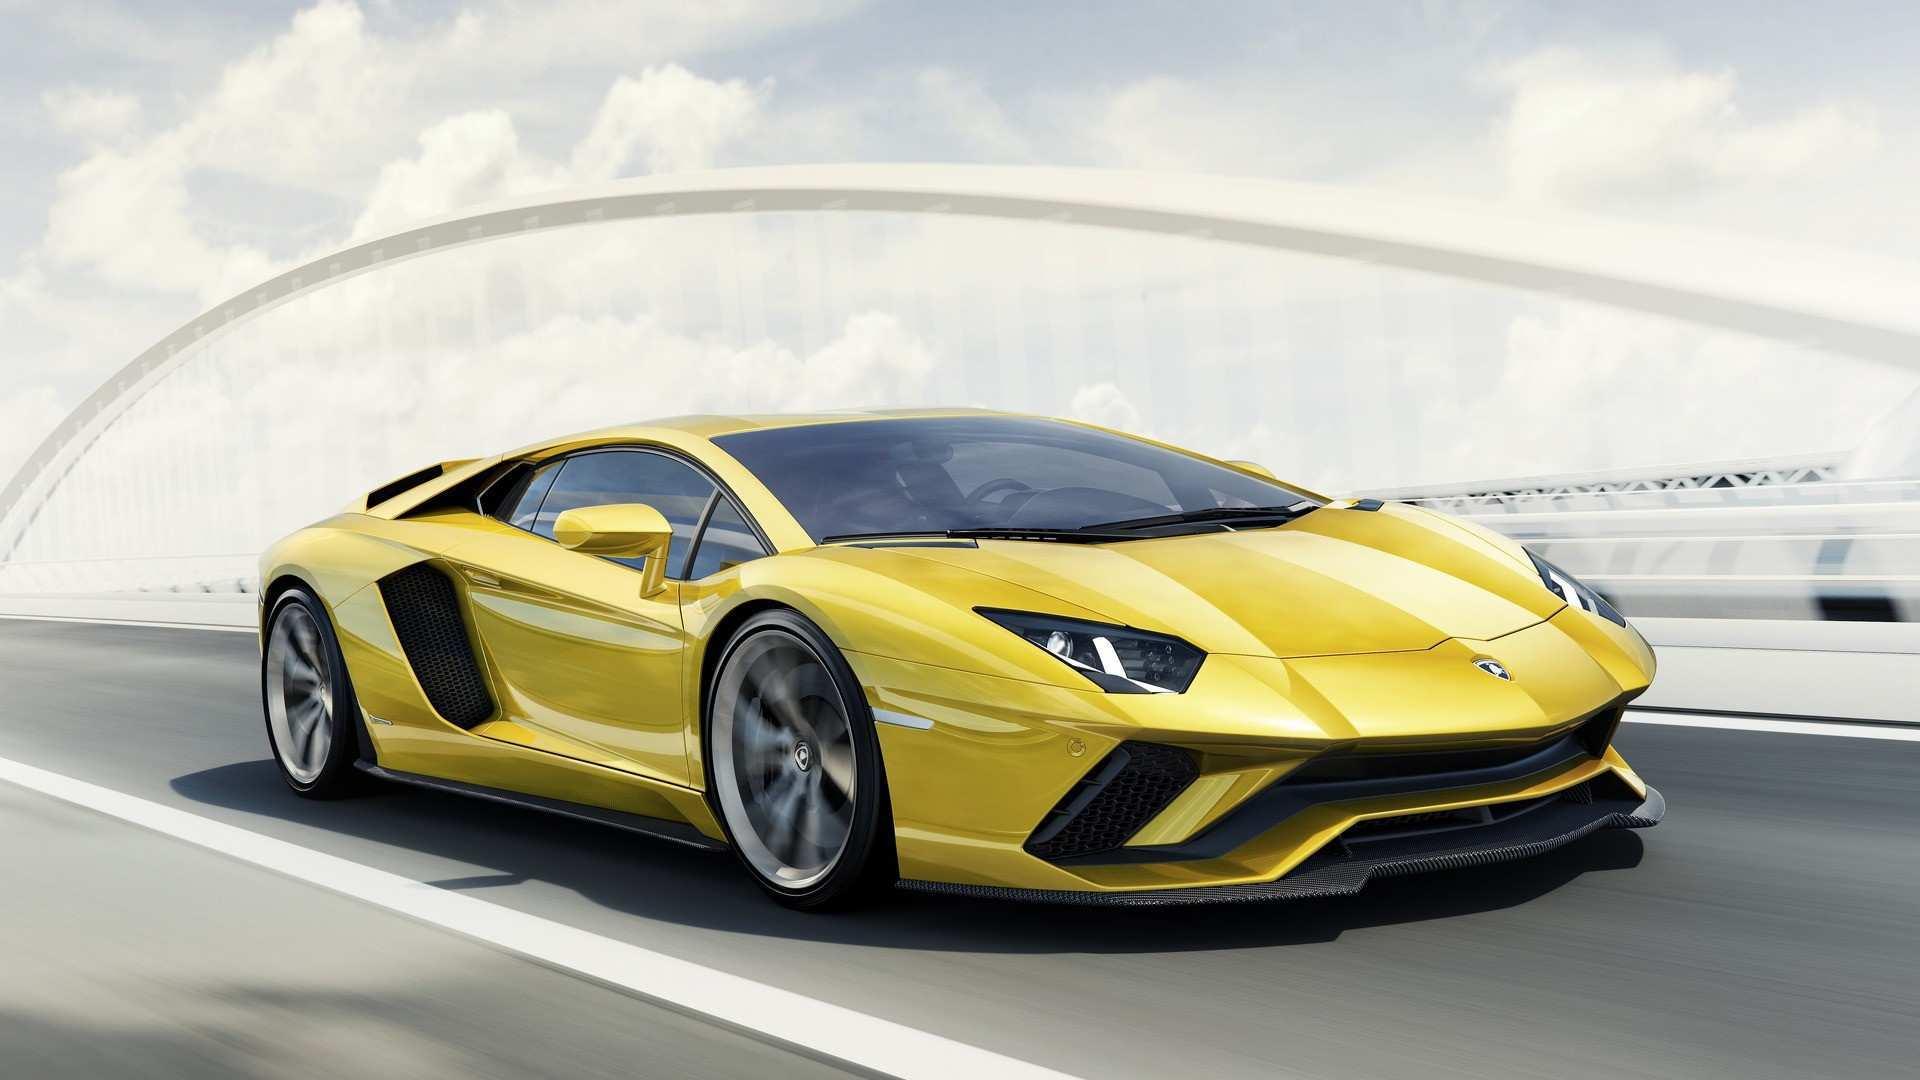 42 Gallery of 2020 Lamborghini Aventador Price Spy Shoot with 2020 Lamborghini Aventador Price